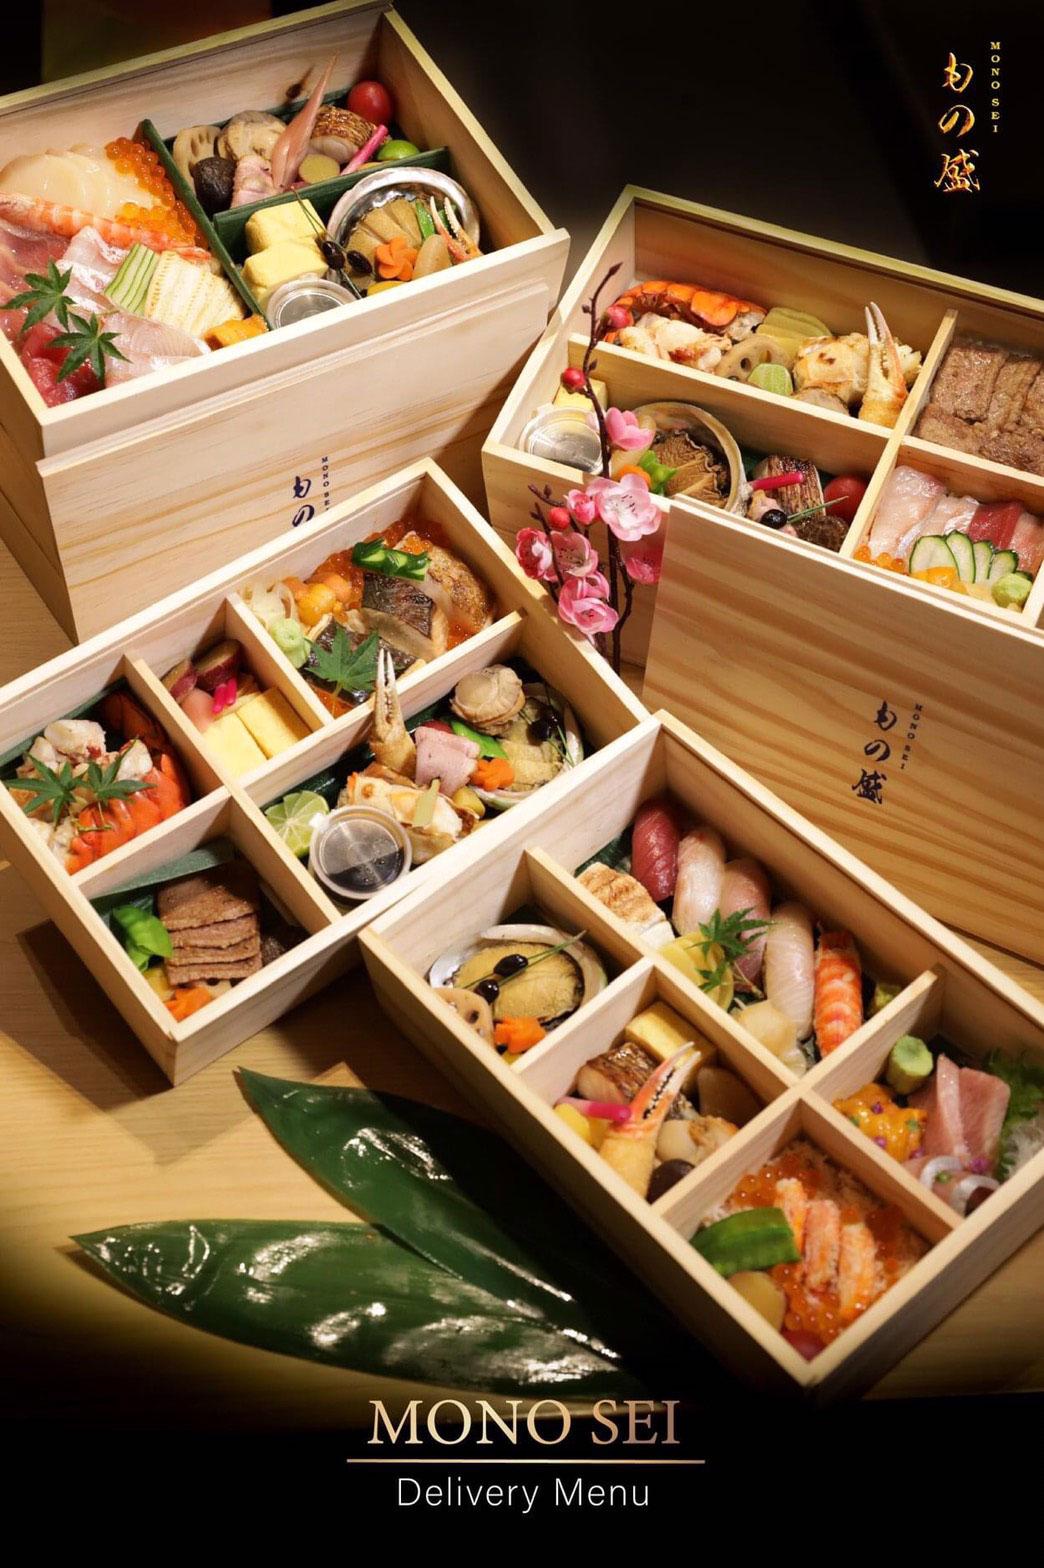 5.Omakase Delivery จากร้าน MONO SEI